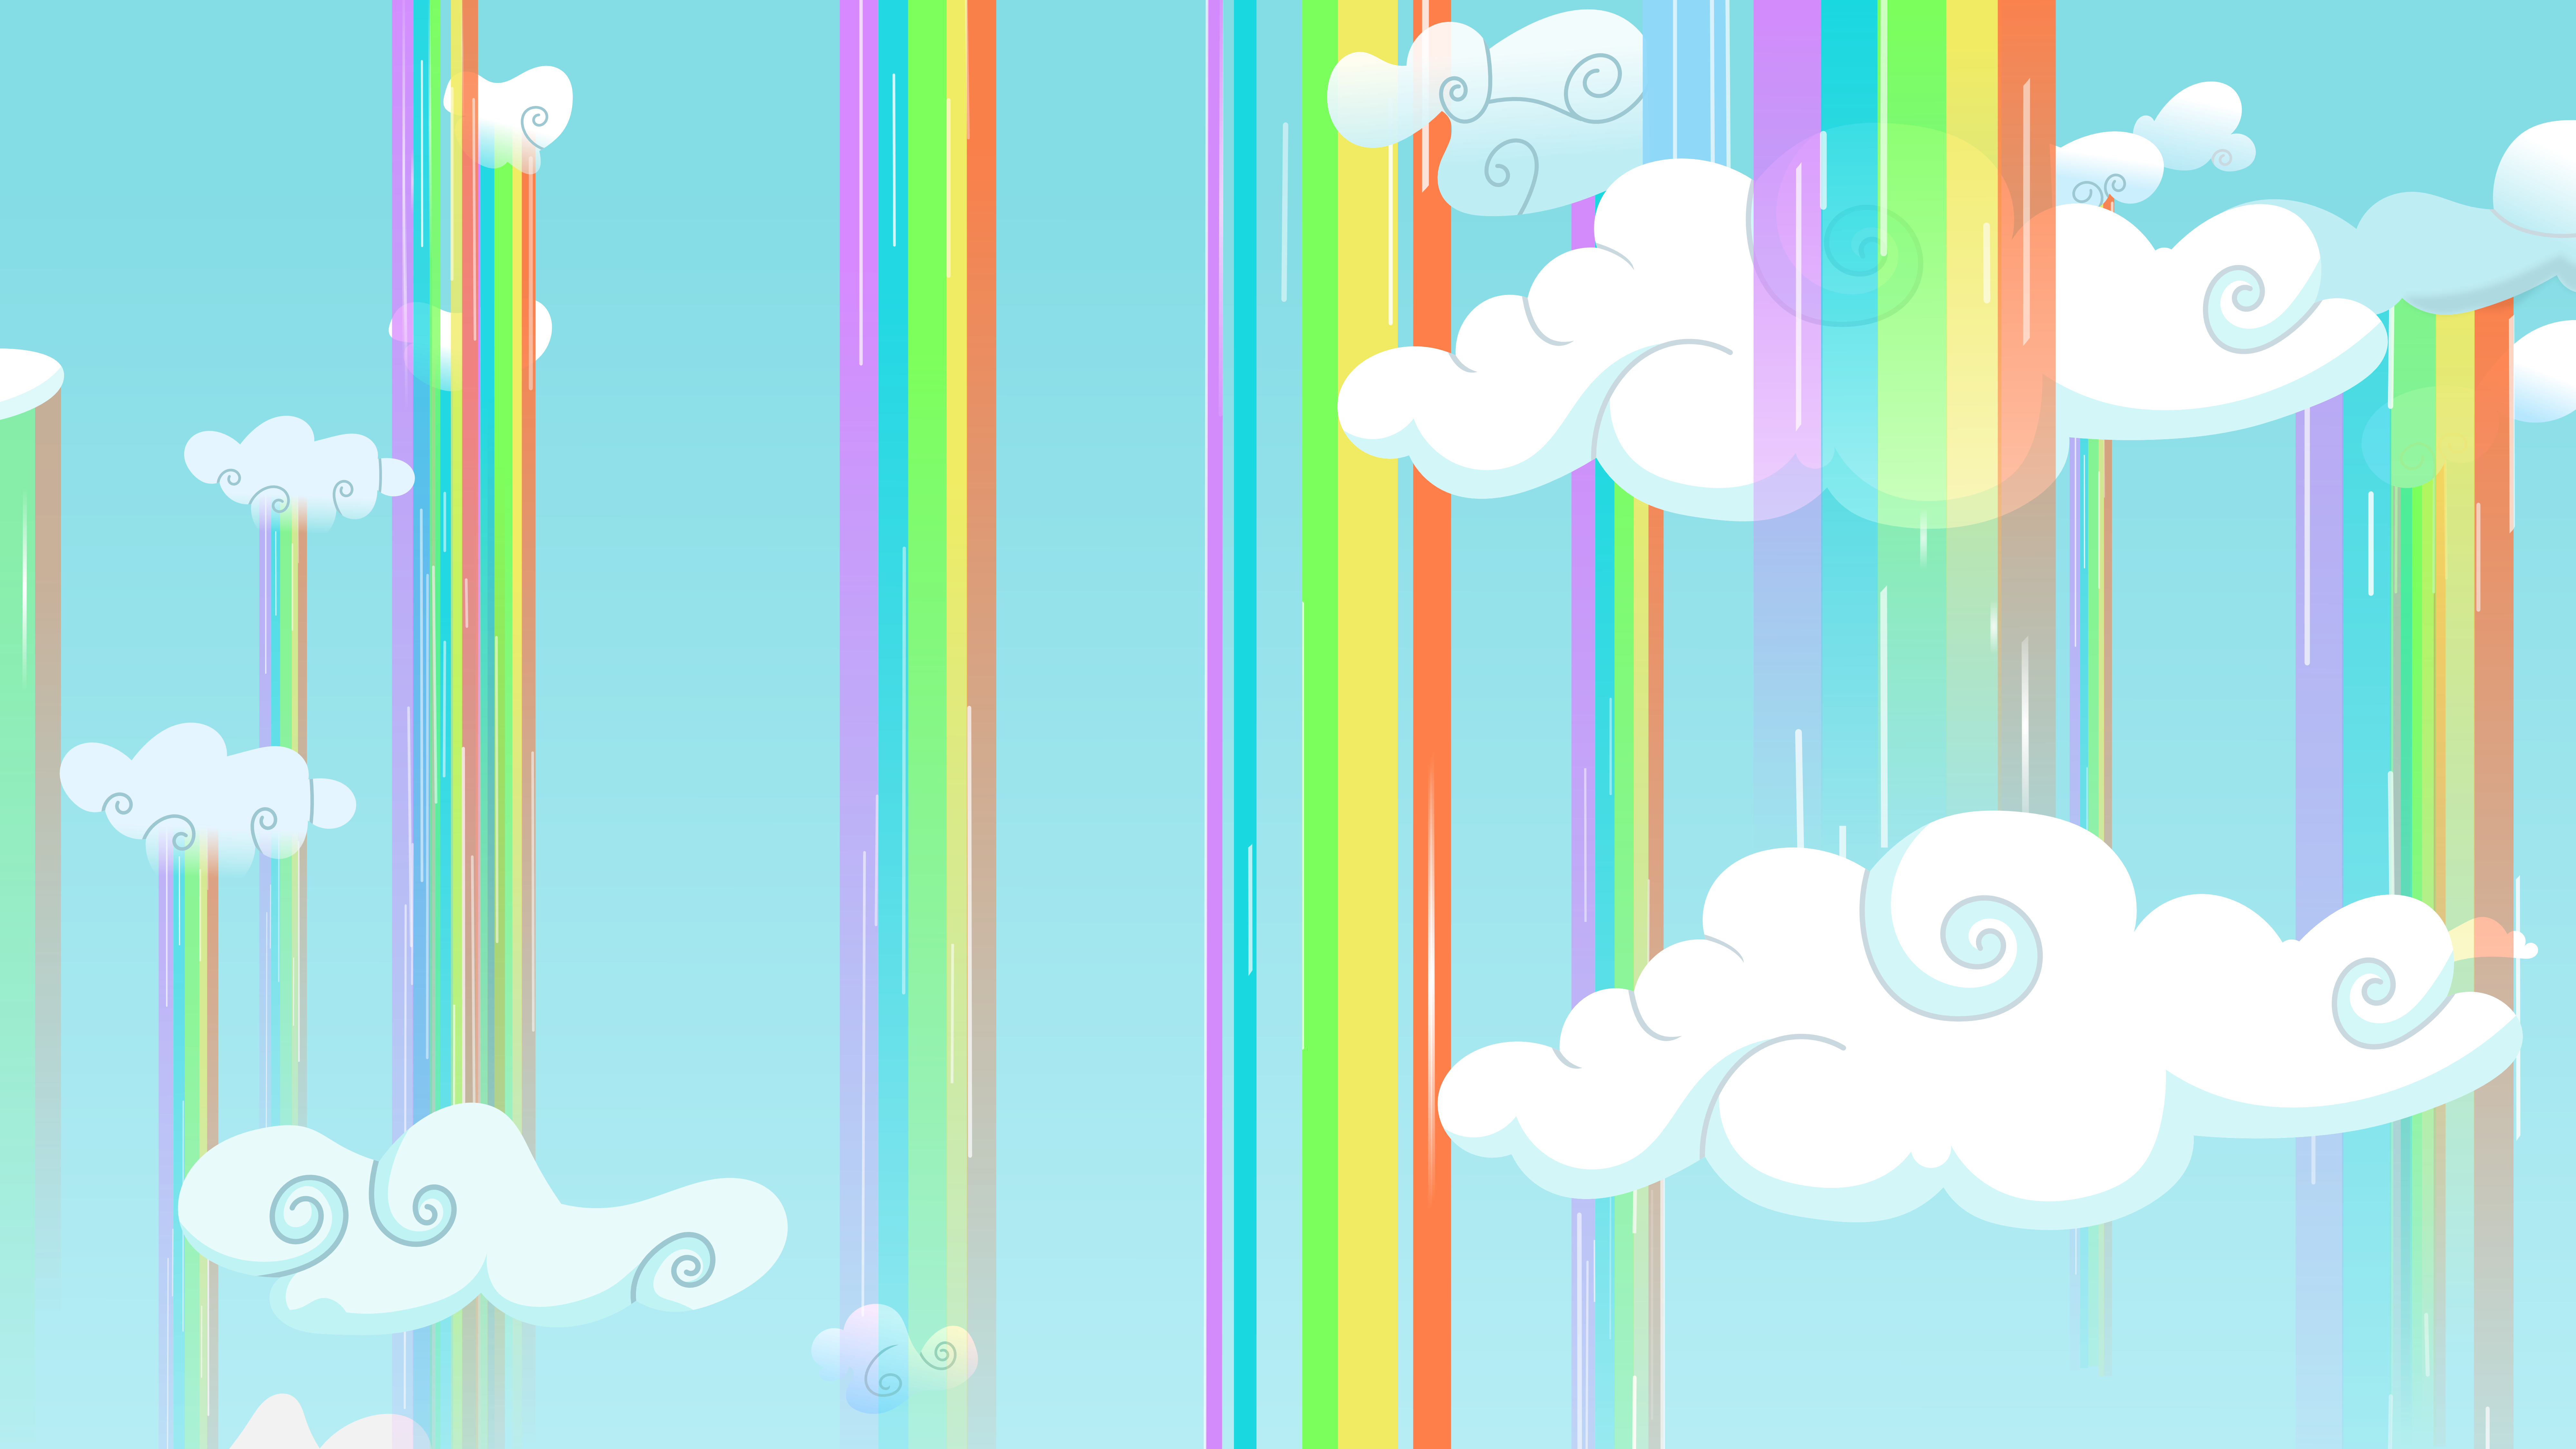 Sky Rainbowfalls by Ambassad0r